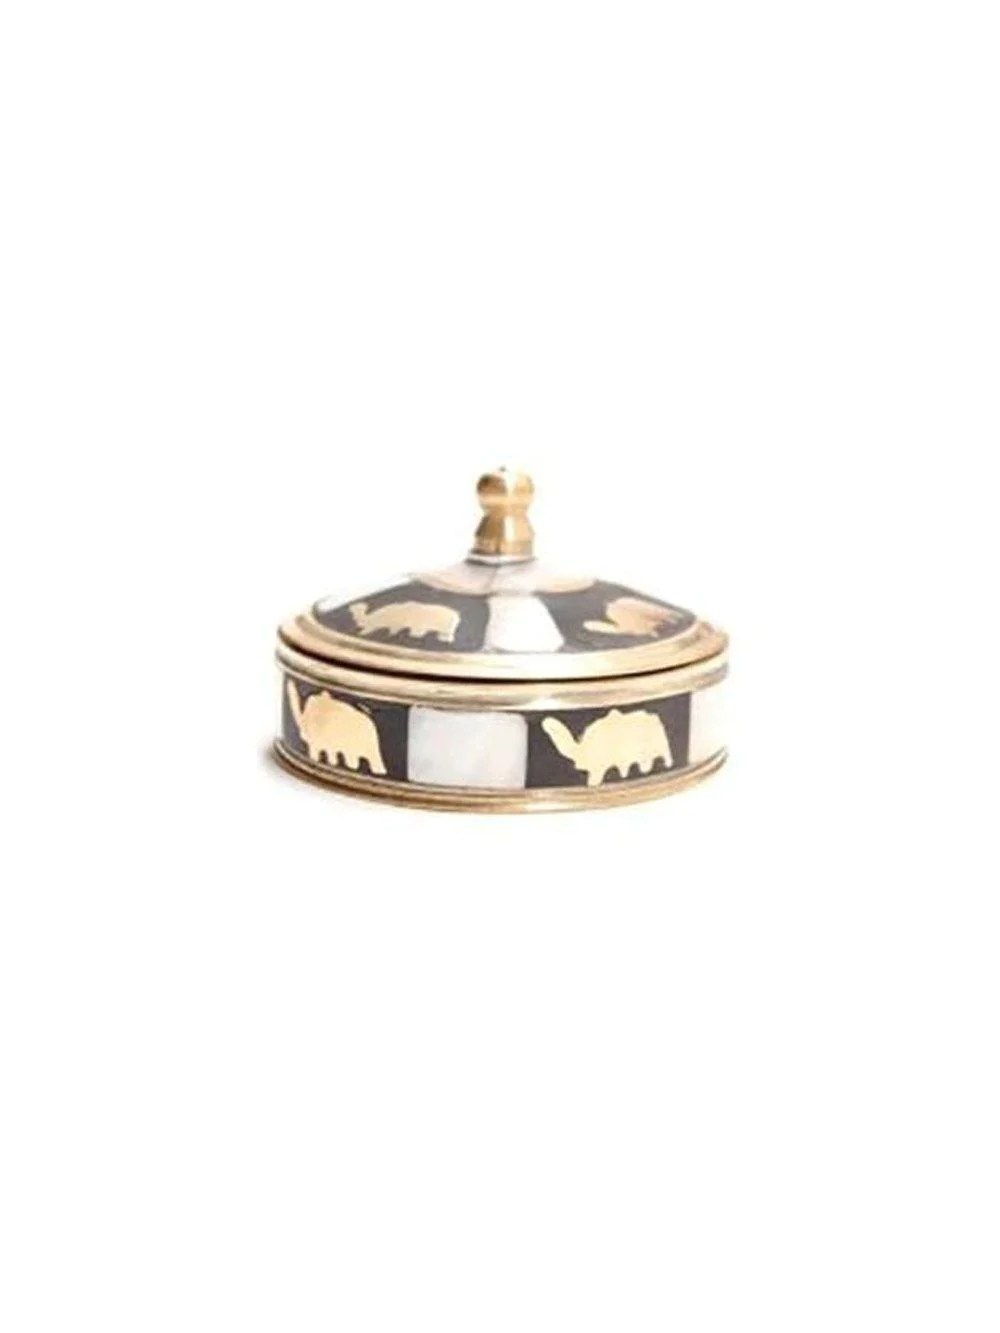 Elephant Jewelry Box : elephant, jewelry, Pearl, Elephant, Jewelry, 1love2hugs3kisses, Ibiza